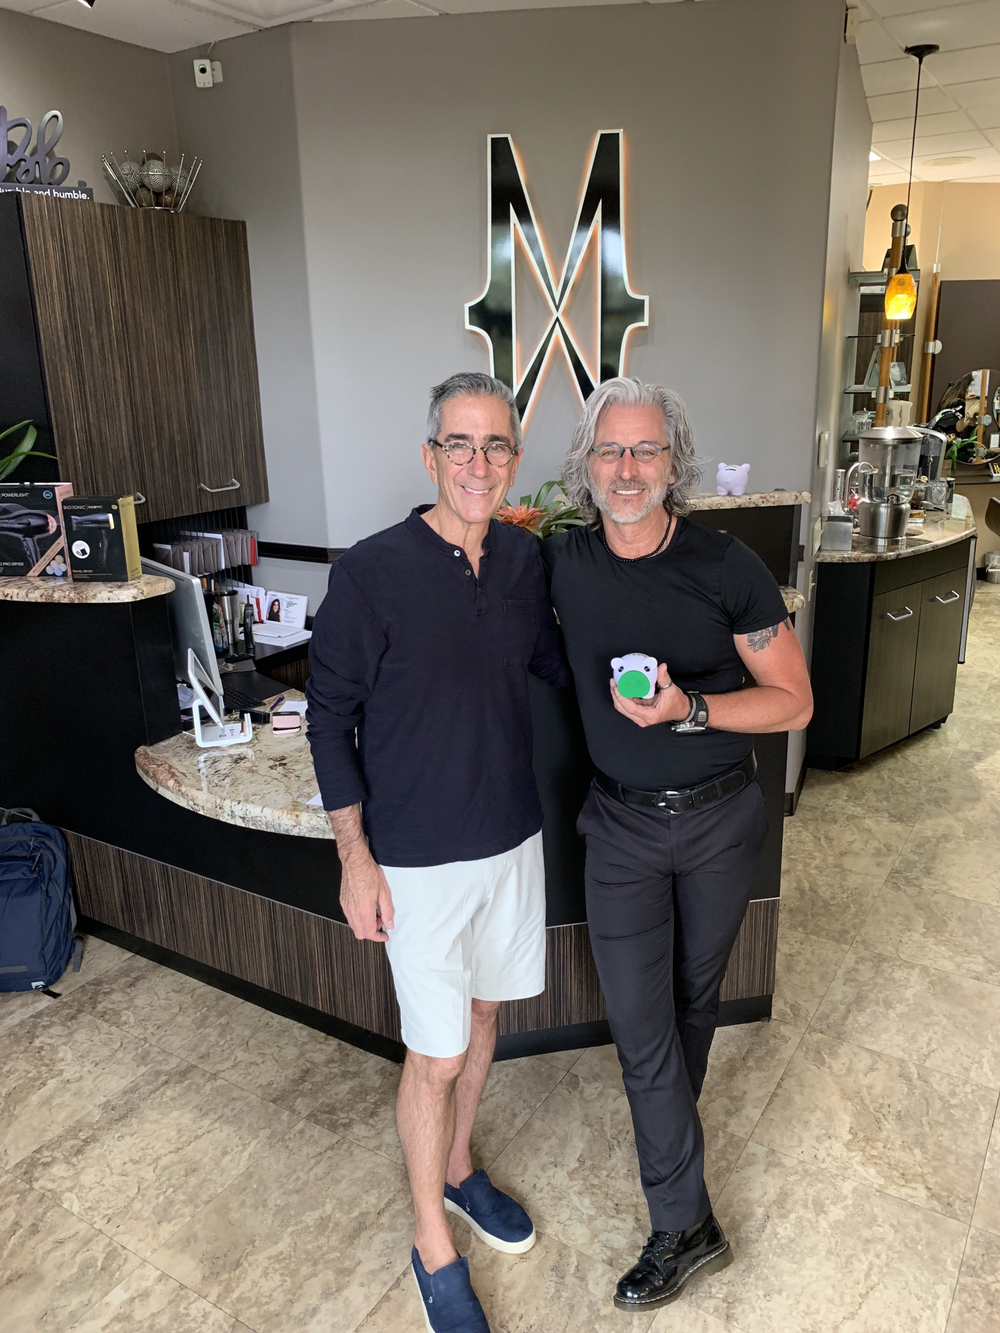 <p>David Tashjian and Mitch Eubanks&nbsp;at the front desk of the Mitchell Wade Hair Salon in Oviedo, Florida.&nbsp;</p>